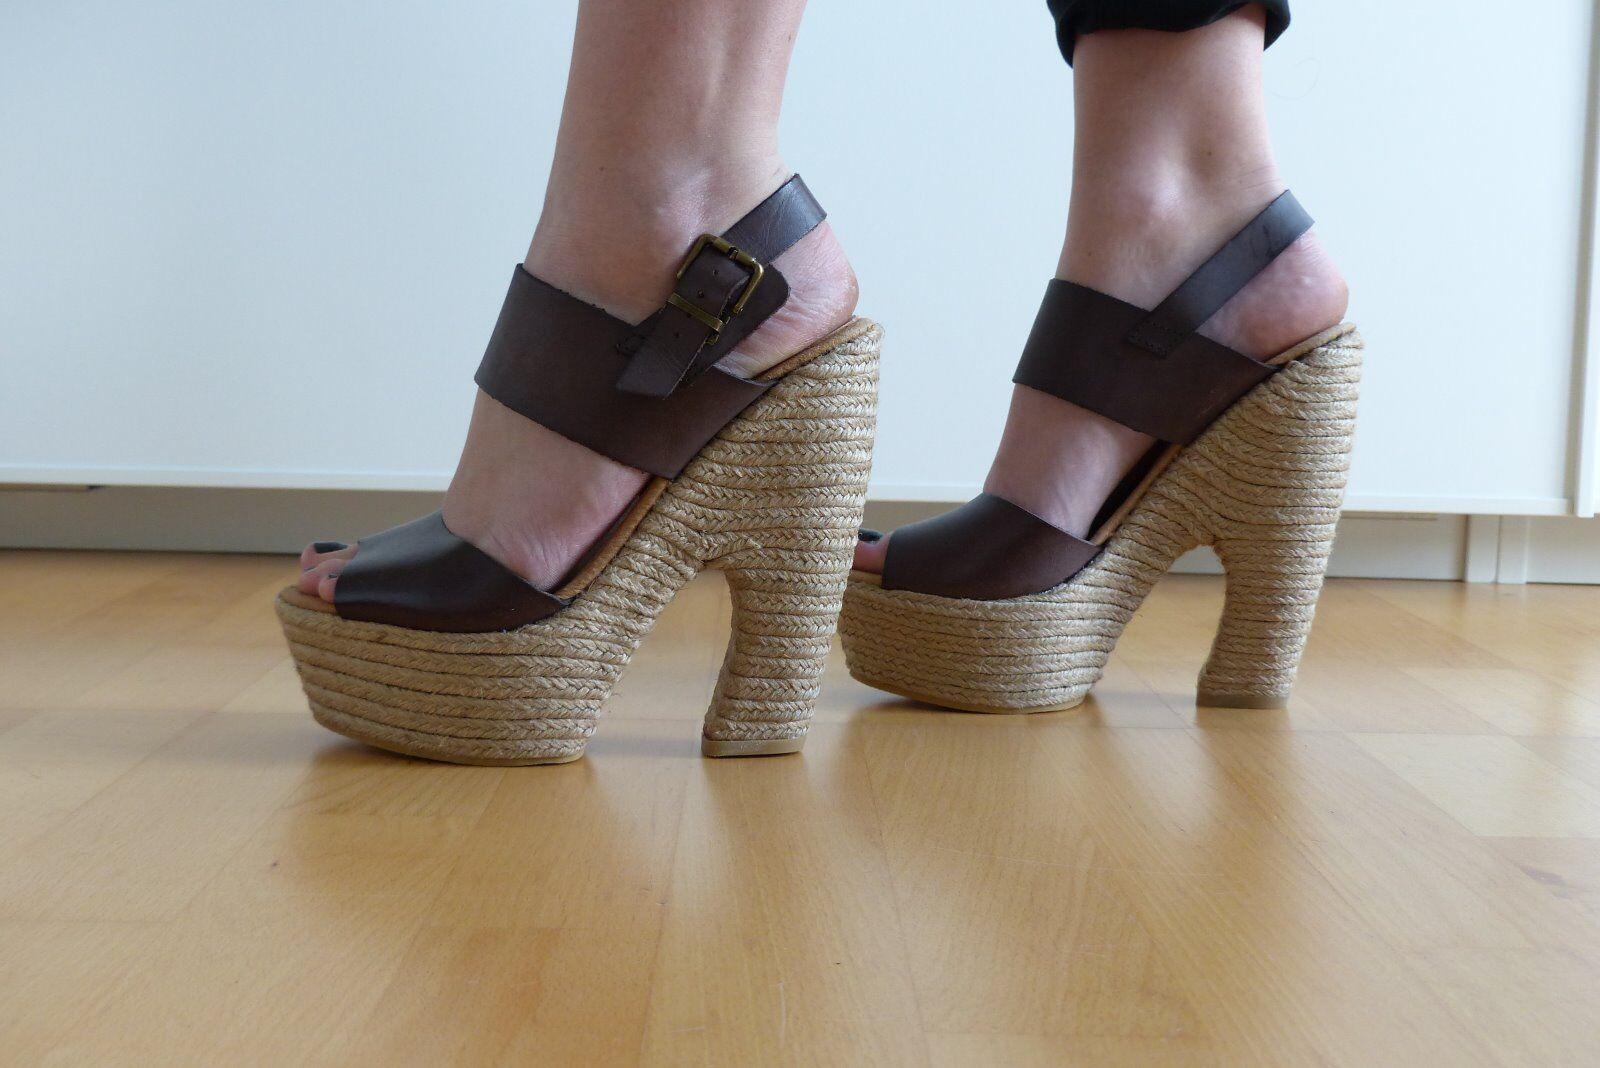 Topshop Sandaletten Sandals Bast Leder marron Gr. 39 UK 6